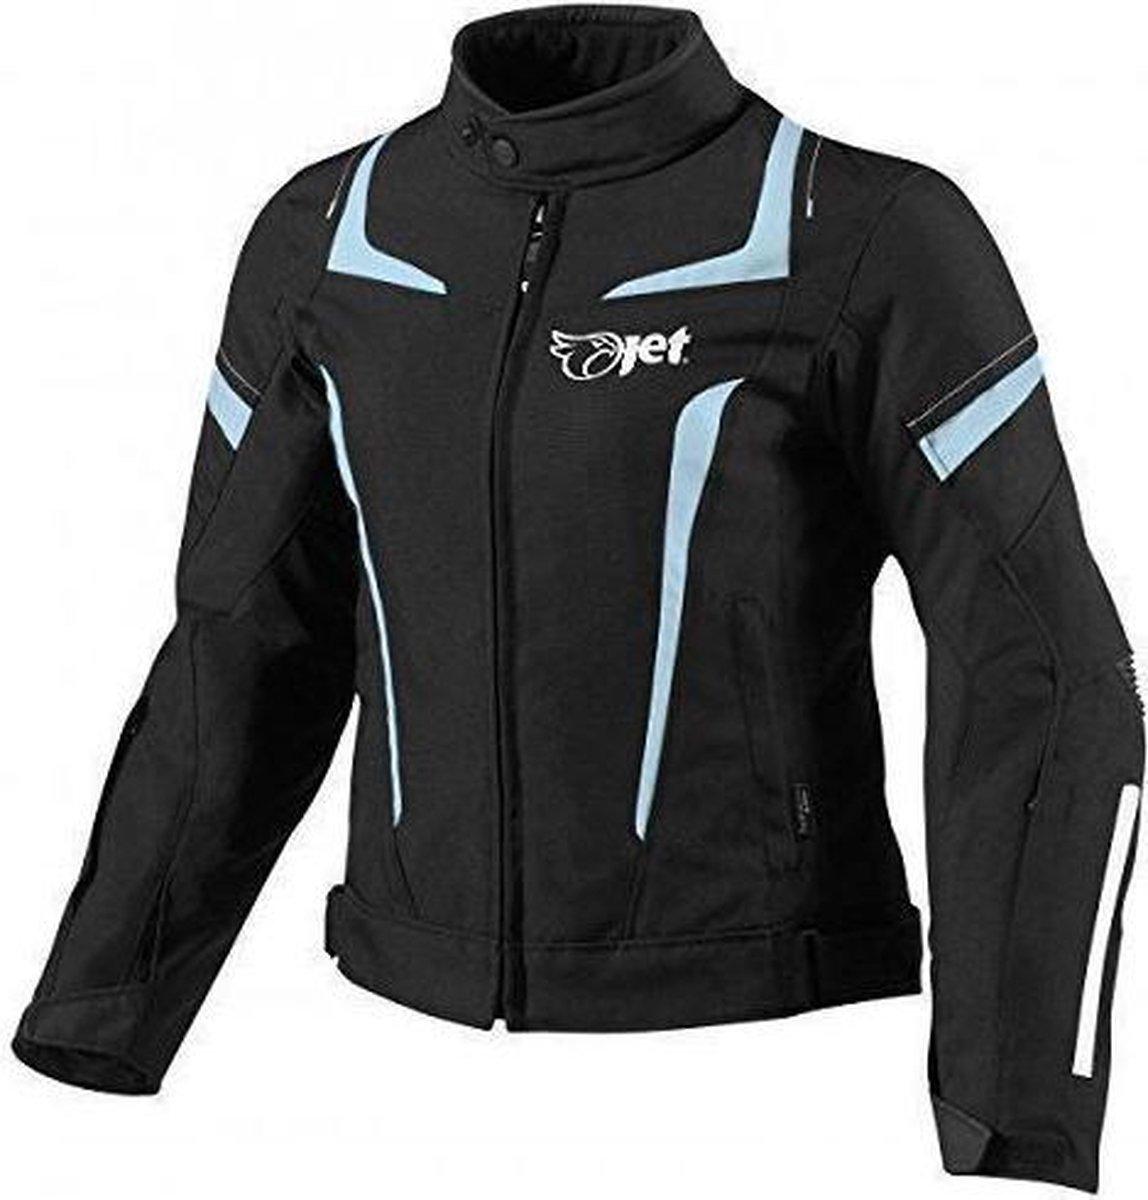 JET Textiele Motorjas Dames - Zwart Blauw - Maat XL